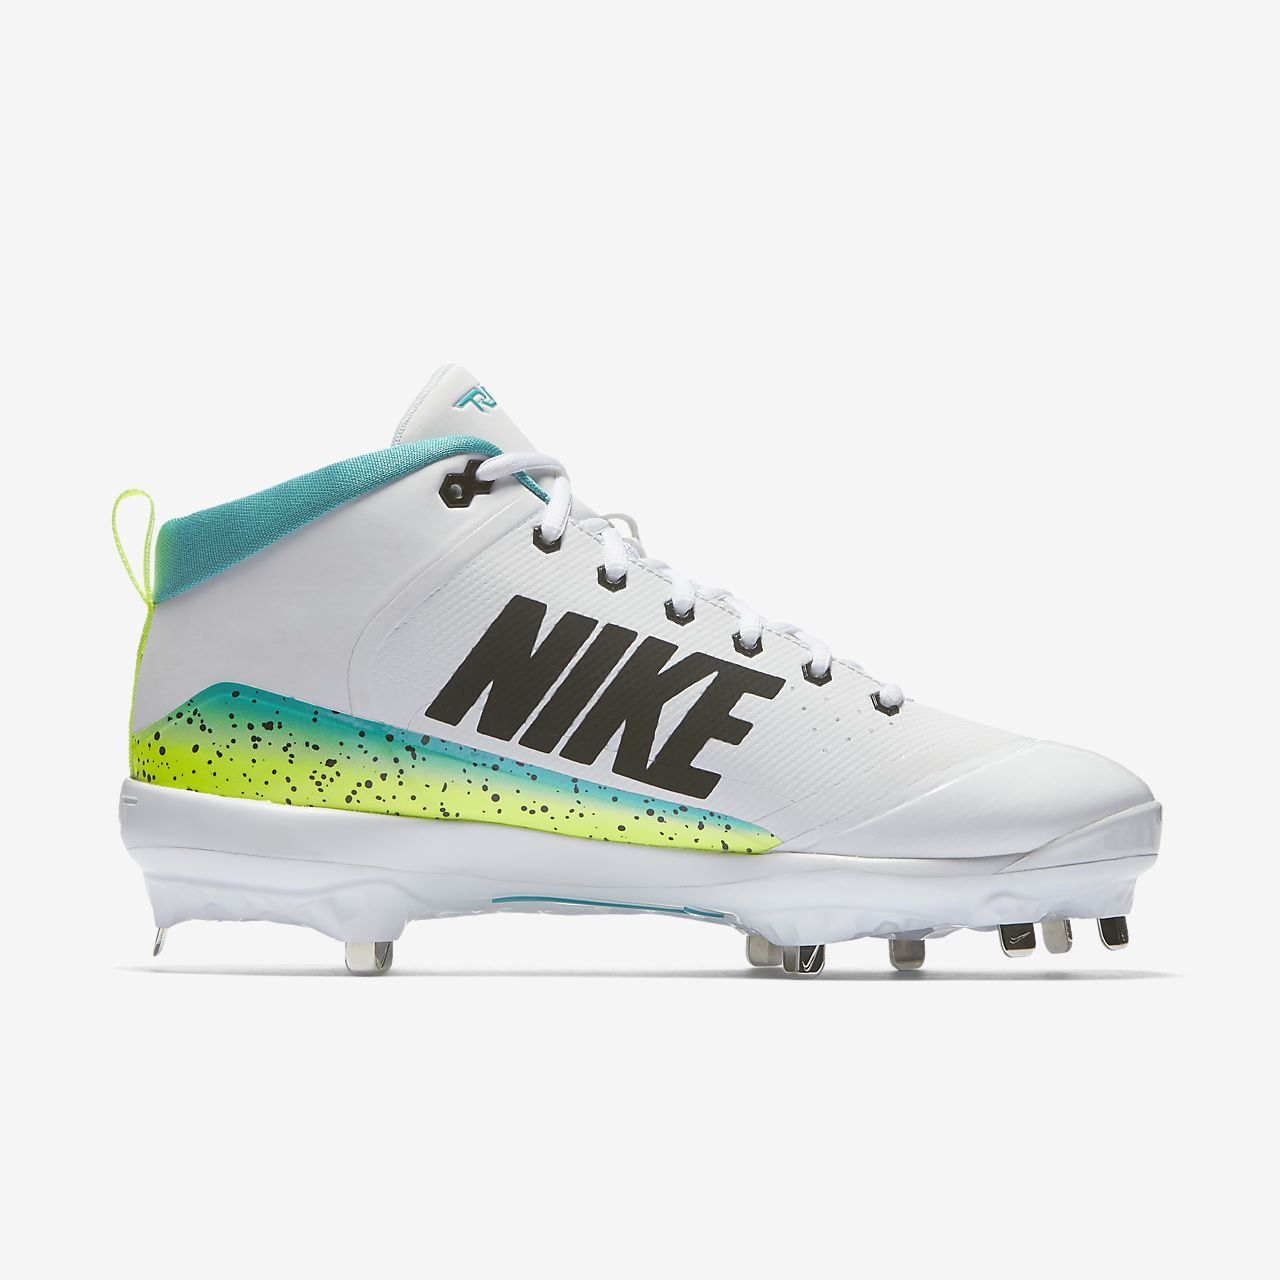 ... Nike Force Air Trout 4 Pro Mahi Men\u0027s Baseball Cleat